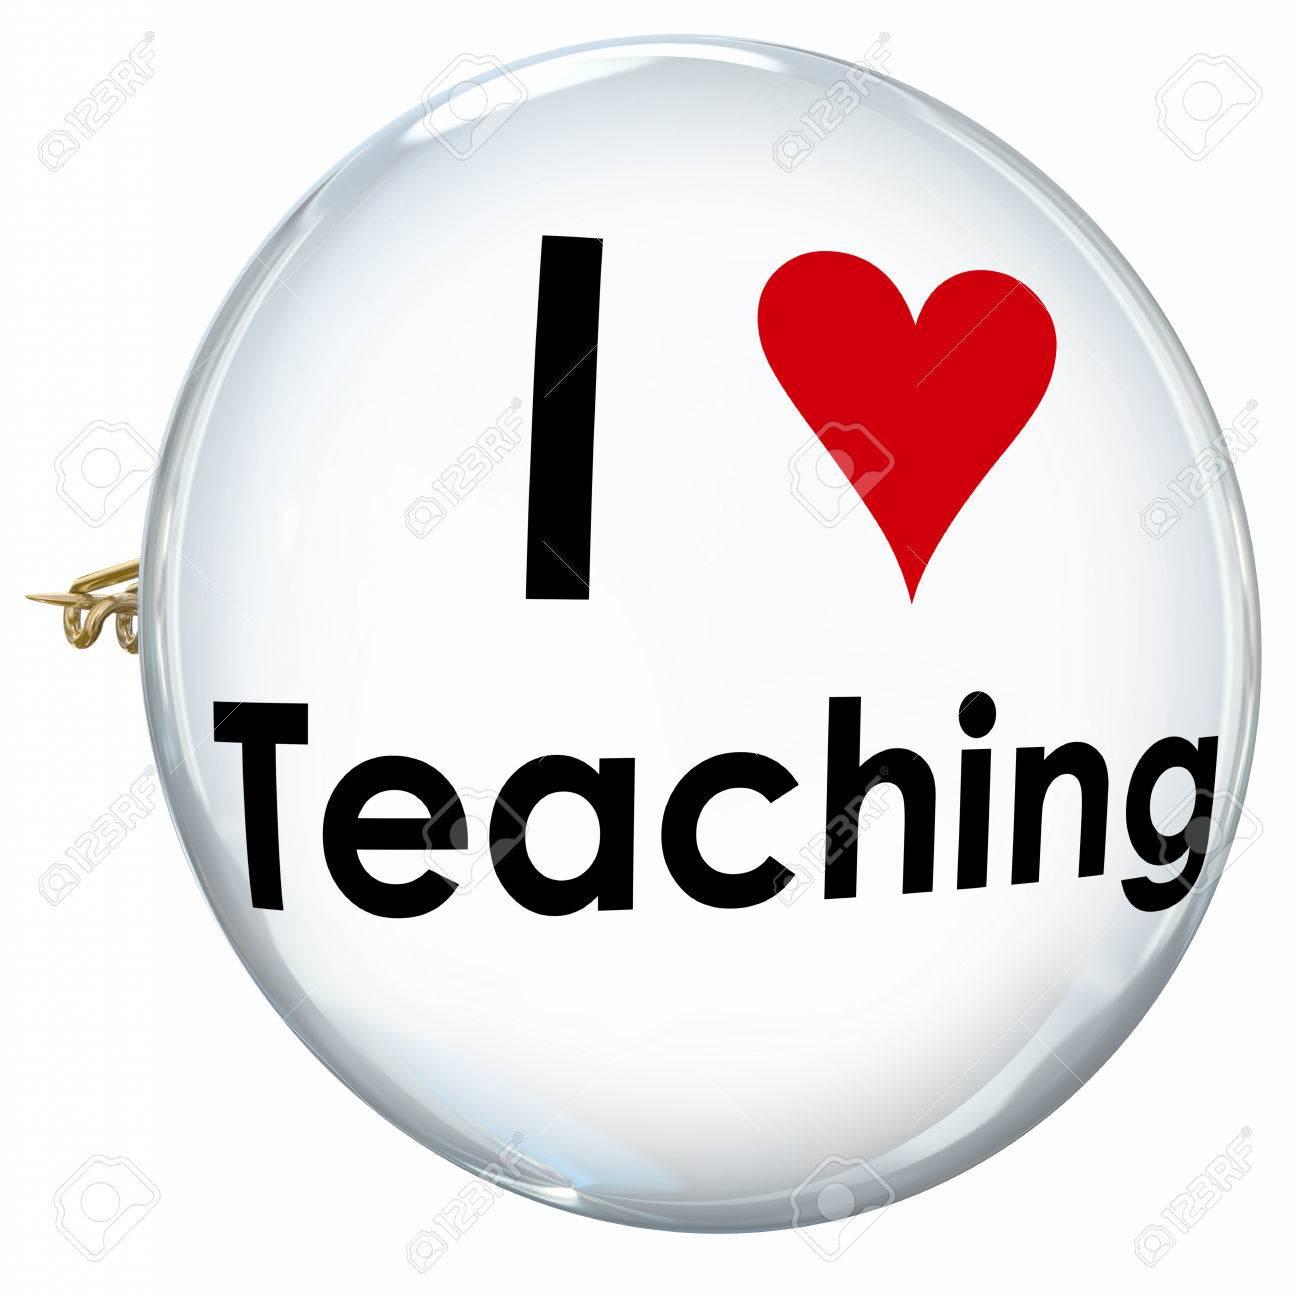 Teaching Love